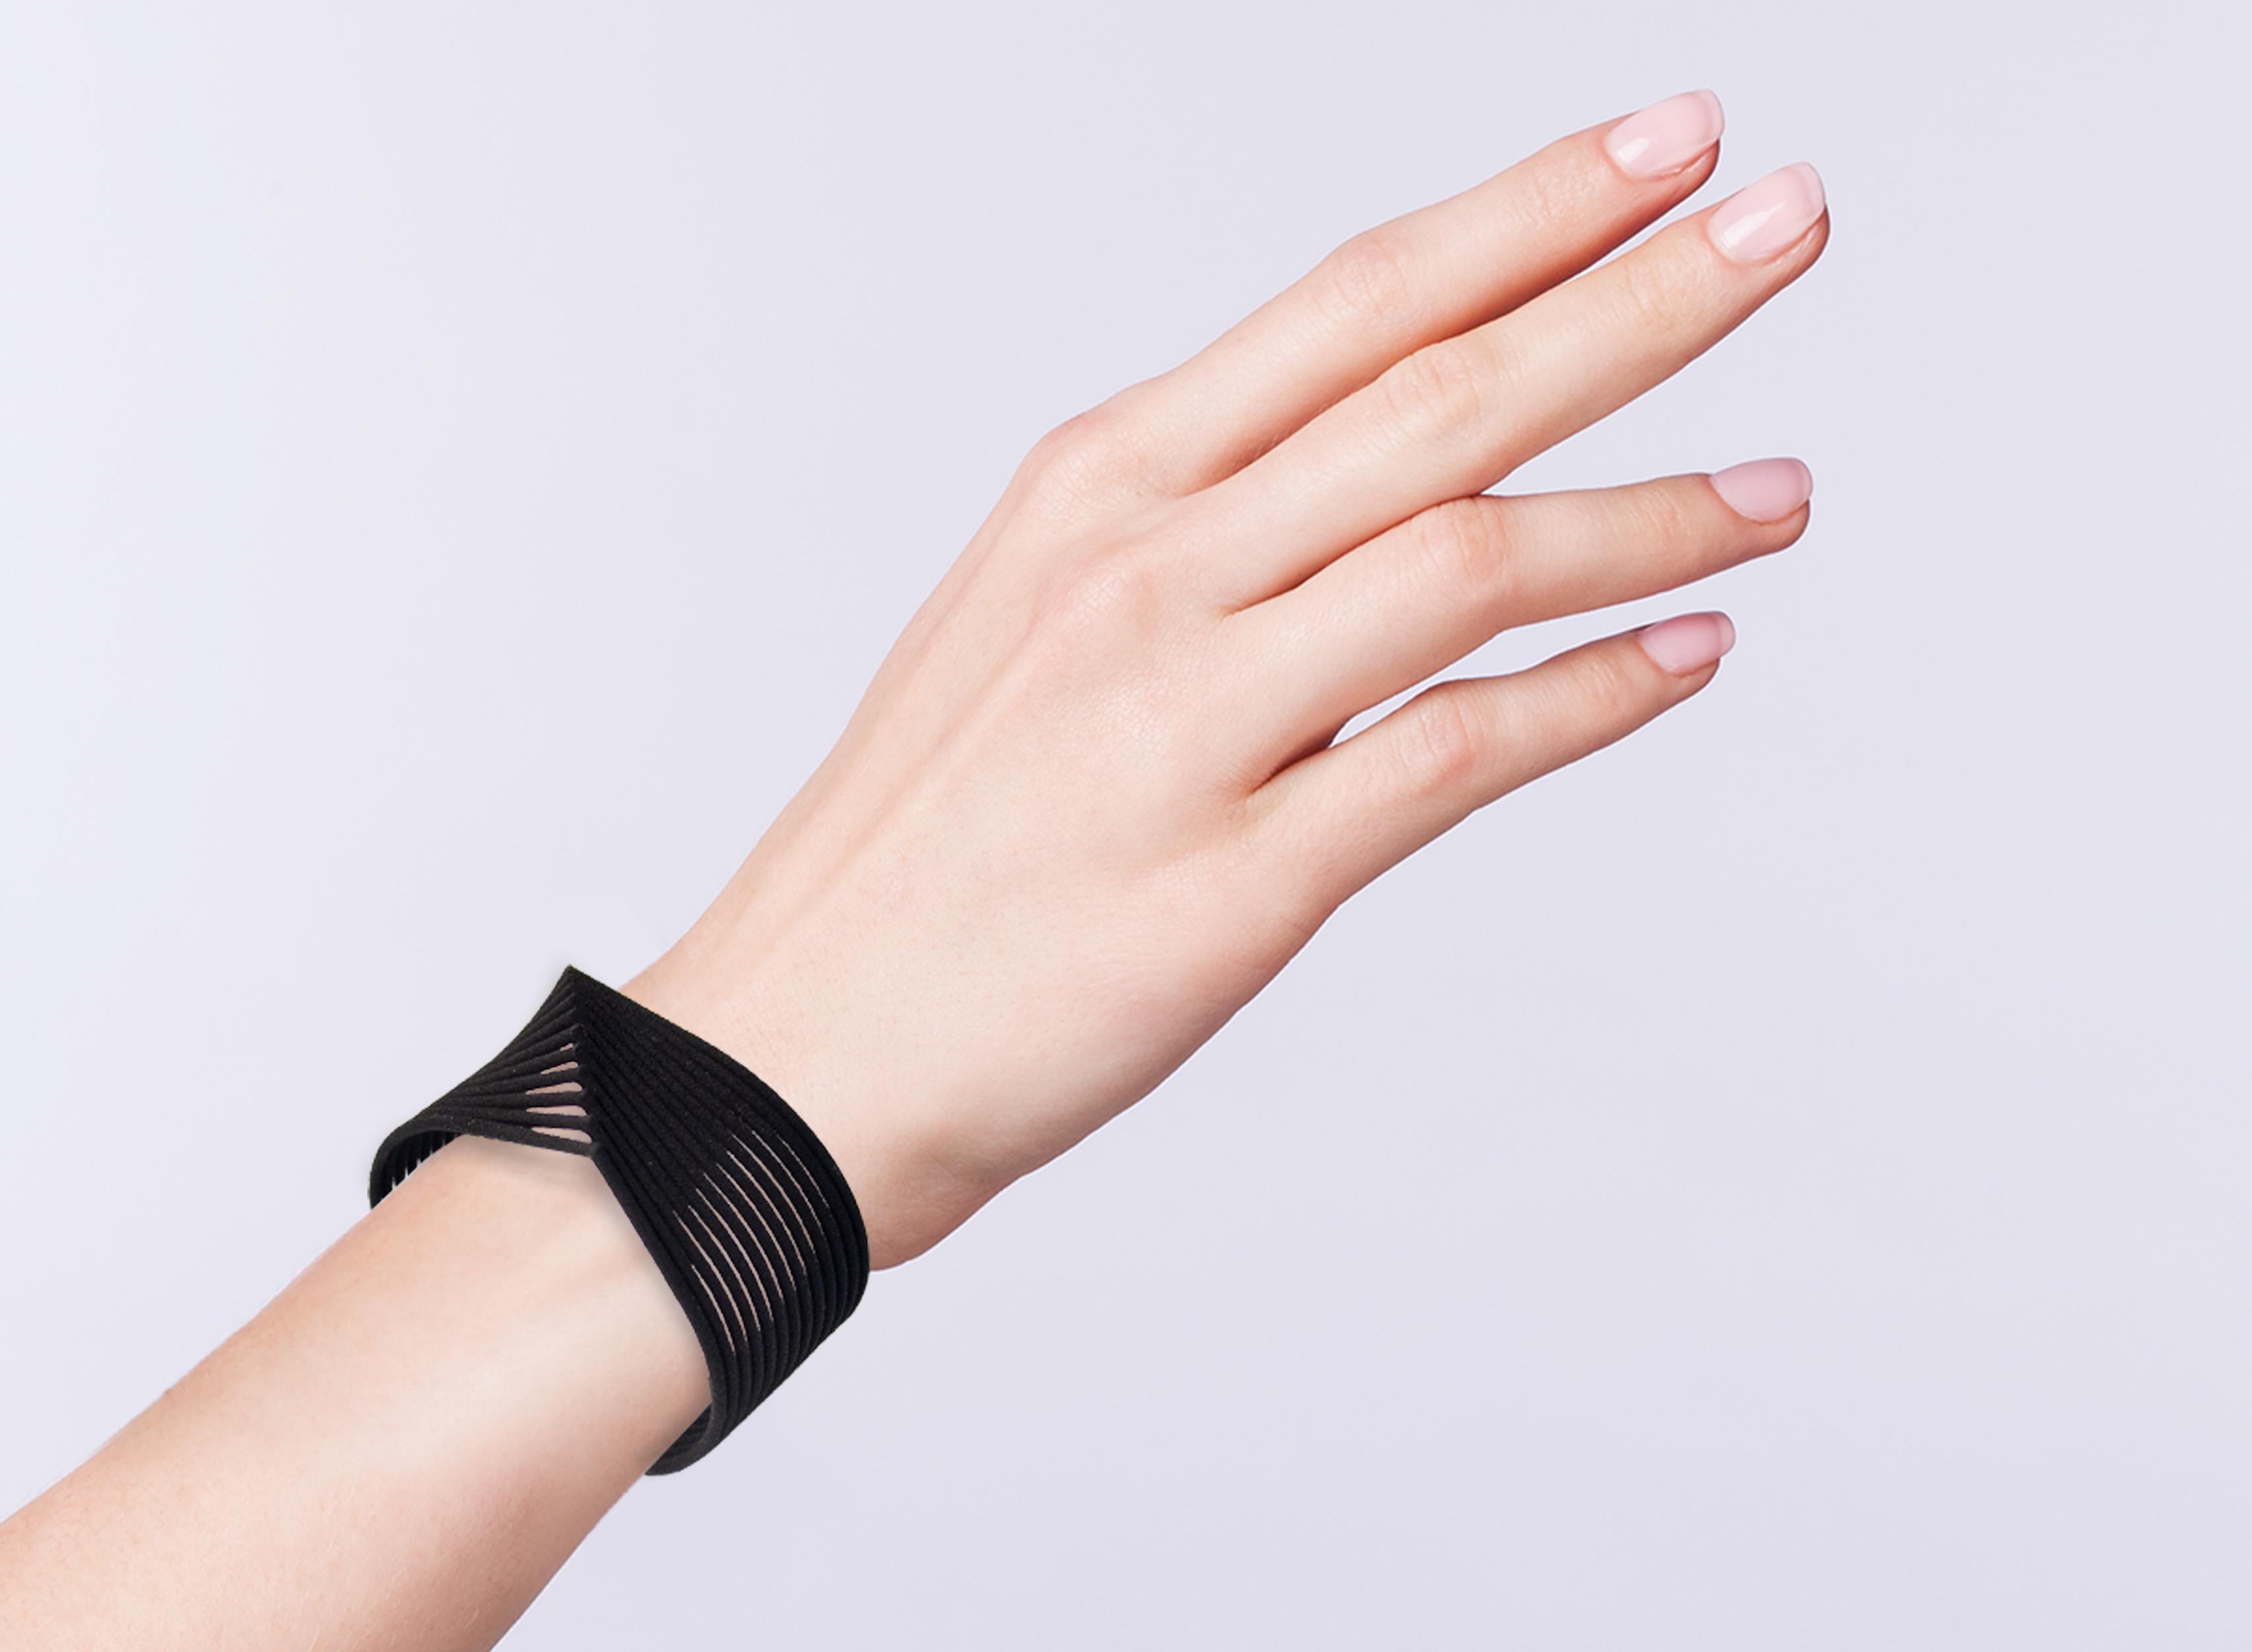 image source: http://www.designboom.com/shop/design/contoured-3d-printed-waves-bracelet-wonderluk-02-04-2016/ last access 12th Oct 2016